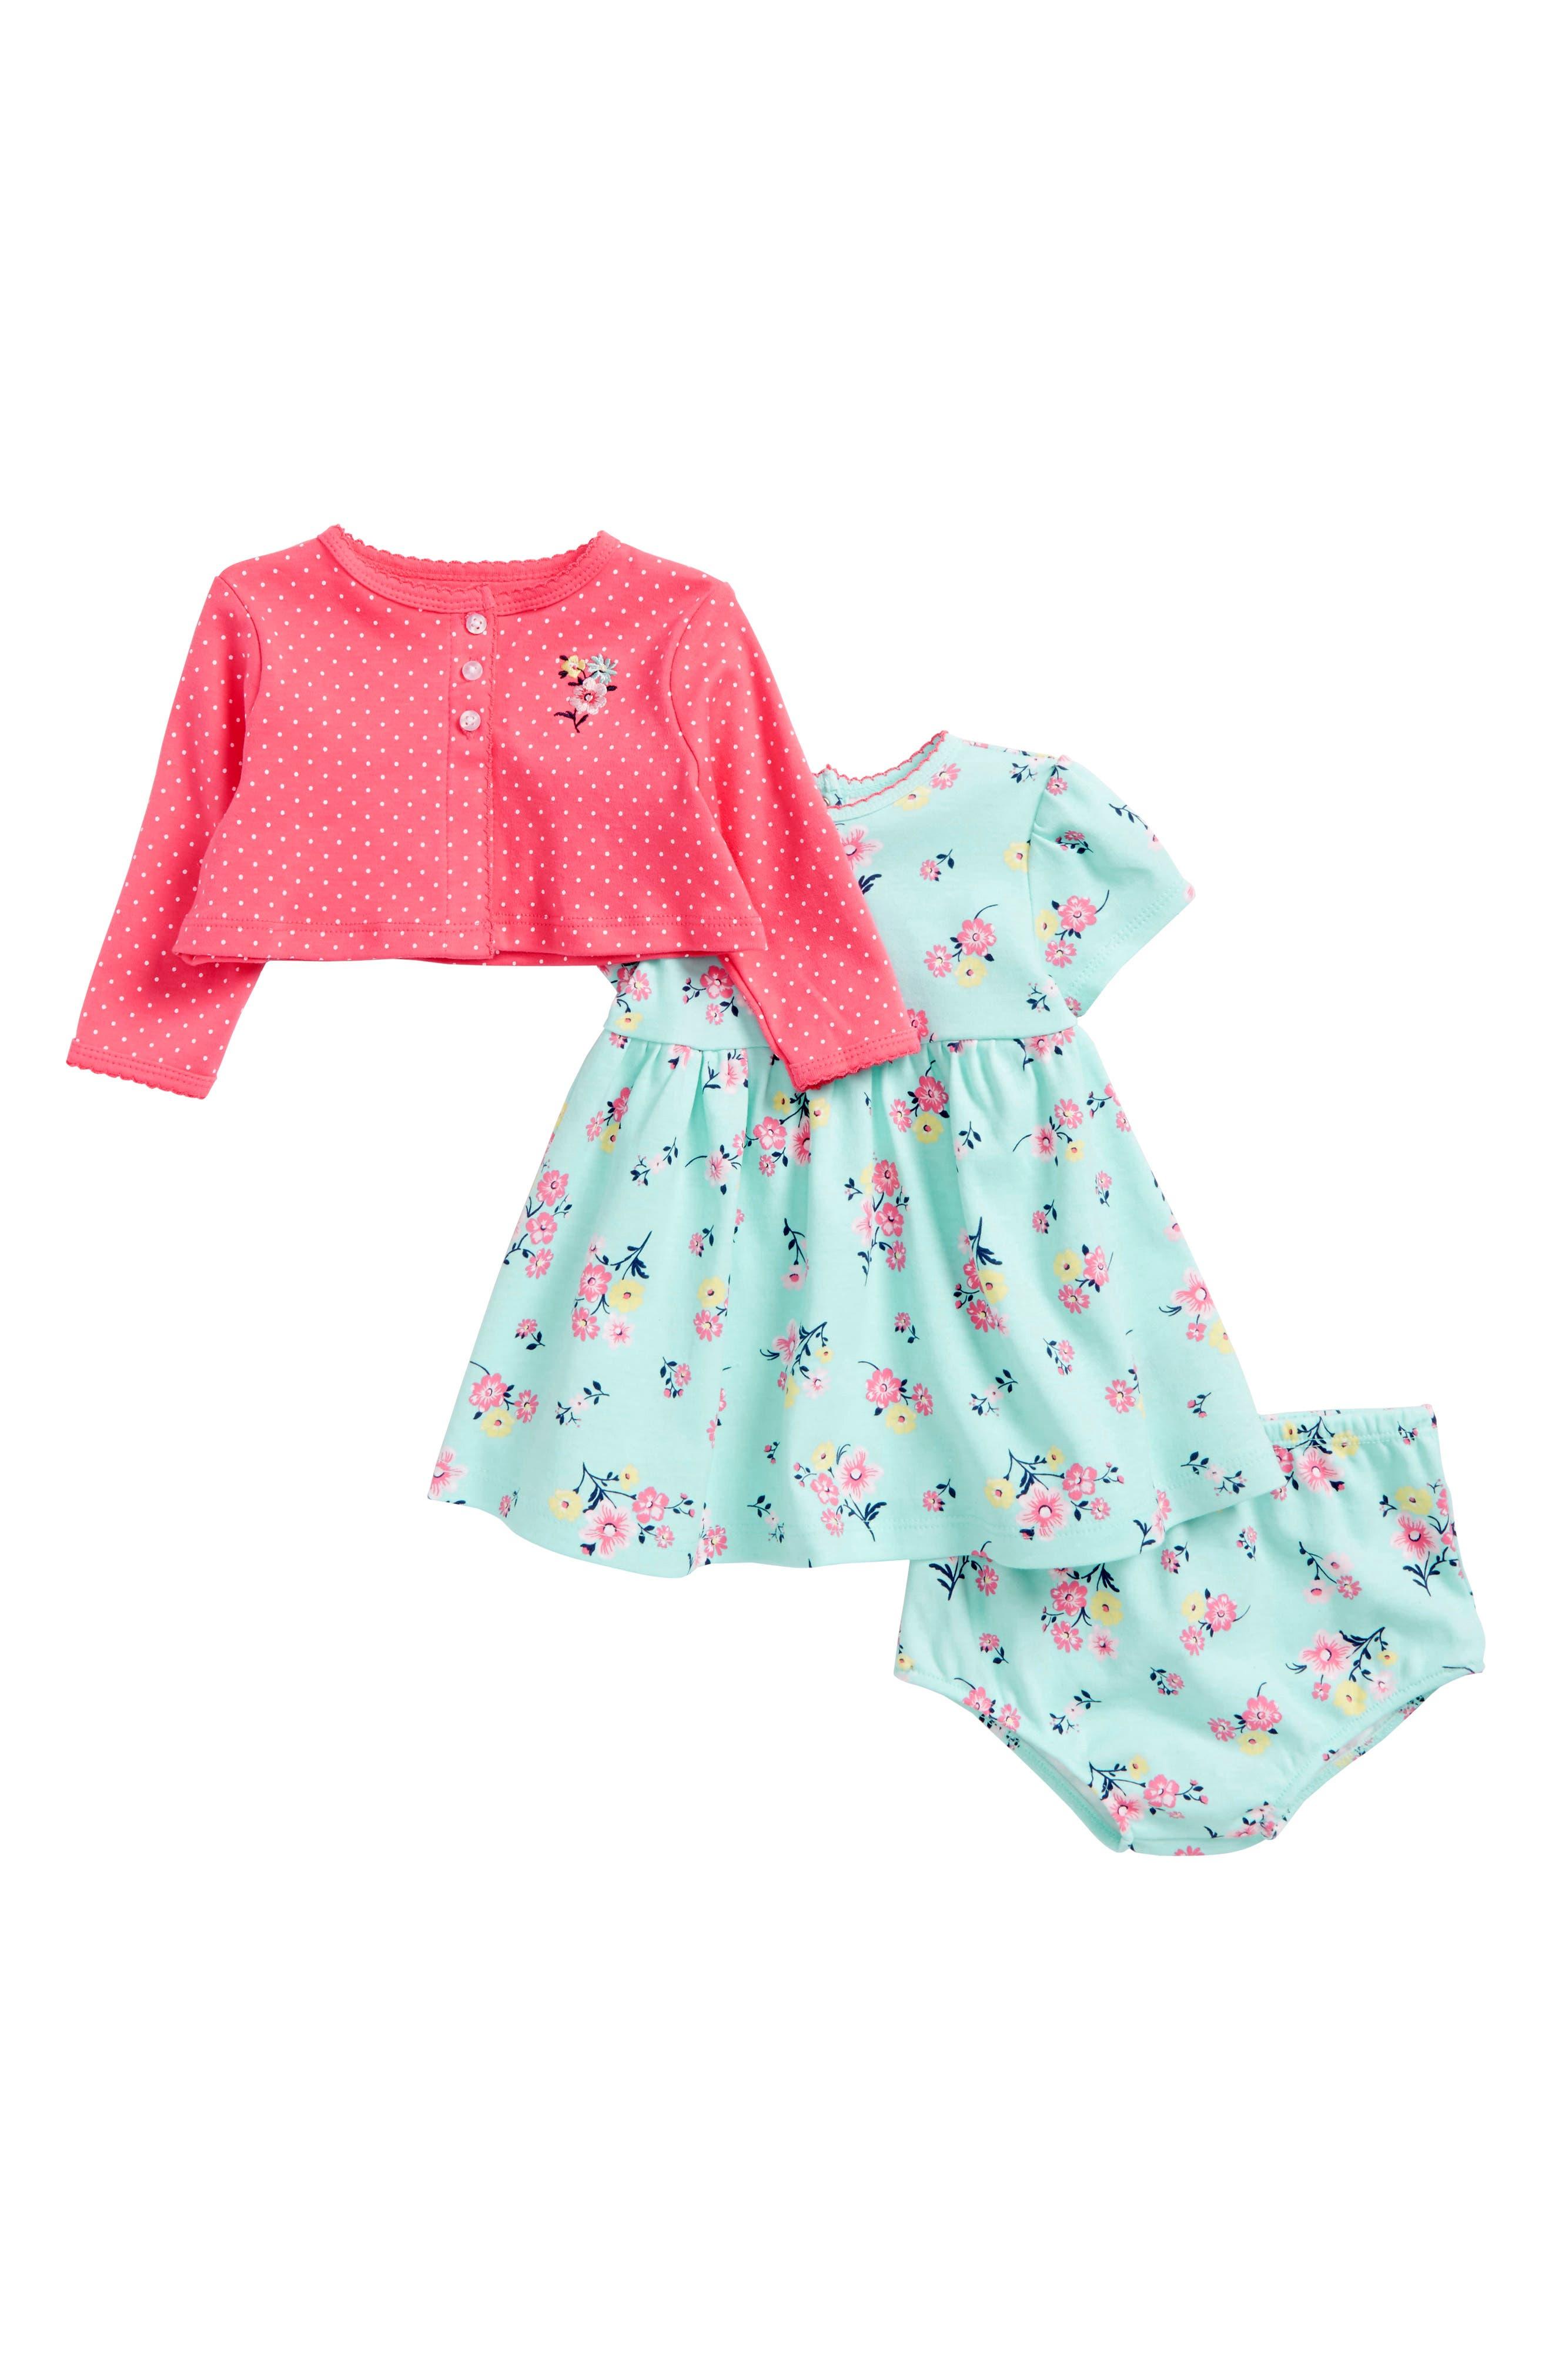 Floral Dress & Cardigan Set,                             Main thumbnail 1, color,                             341